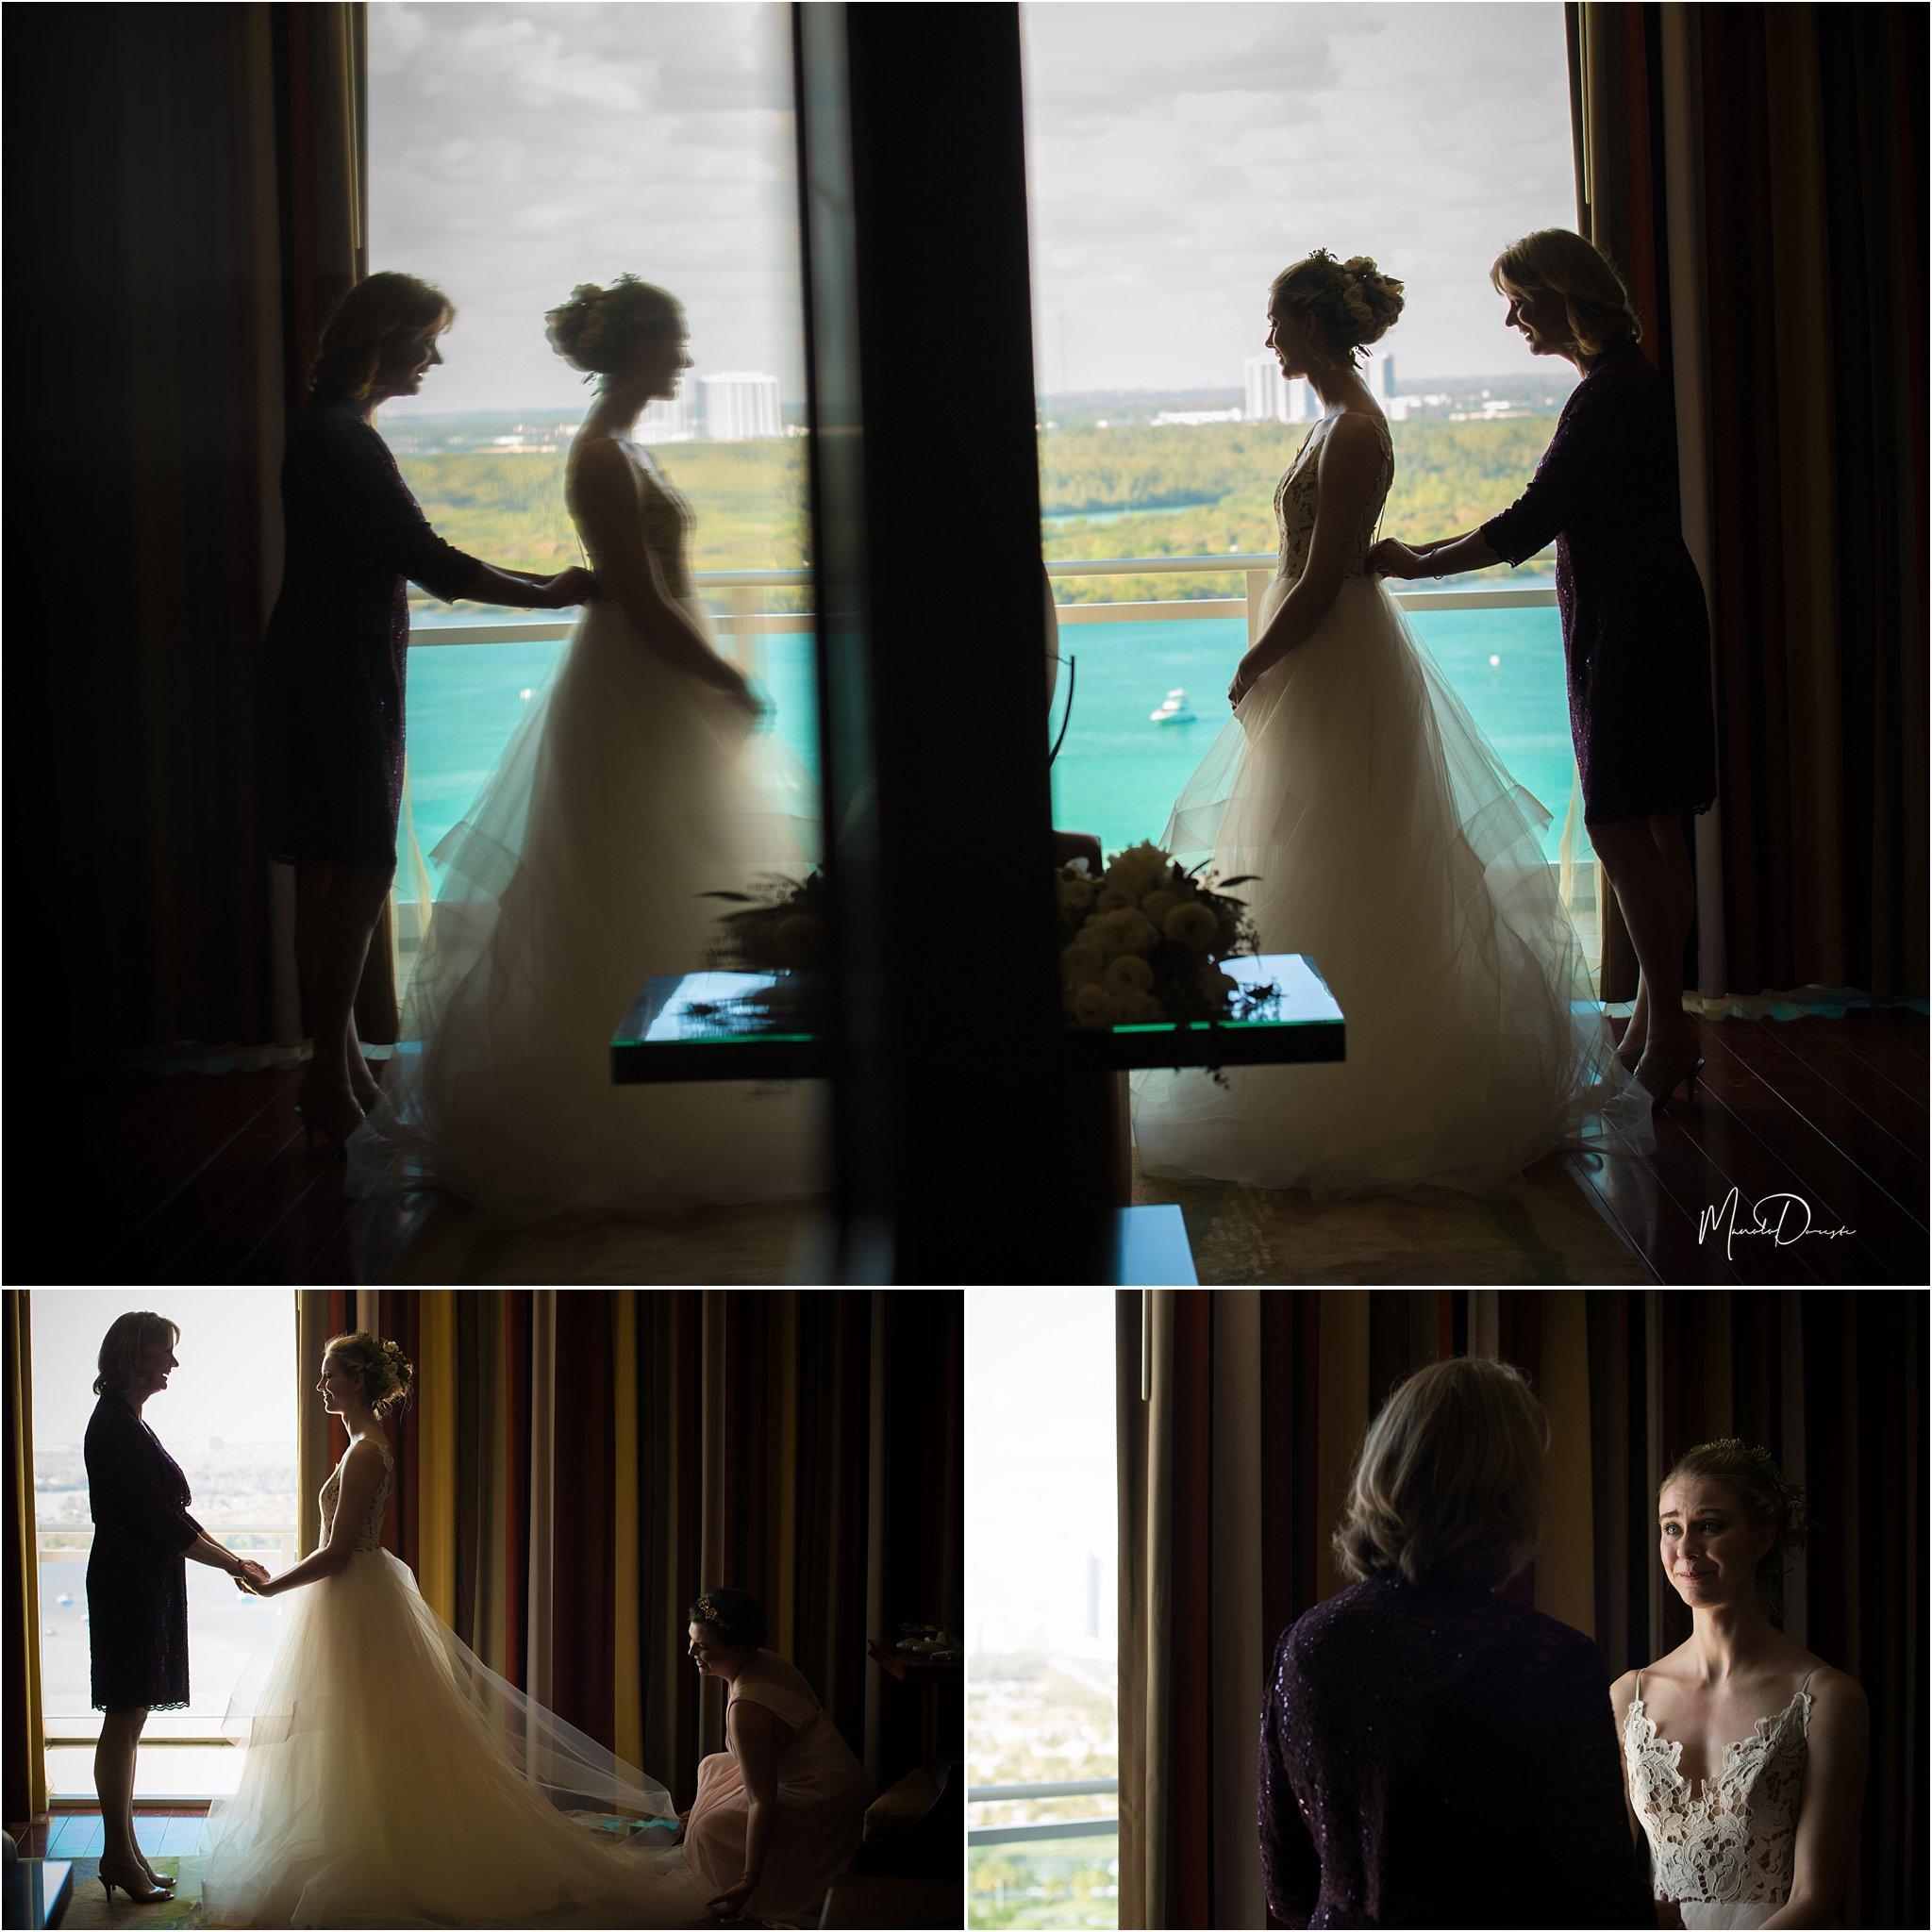 00873_ManoloDoreste_InFocusStudios_Wedding_Family_Photography_Miami_MiamiPhotographer.jpg